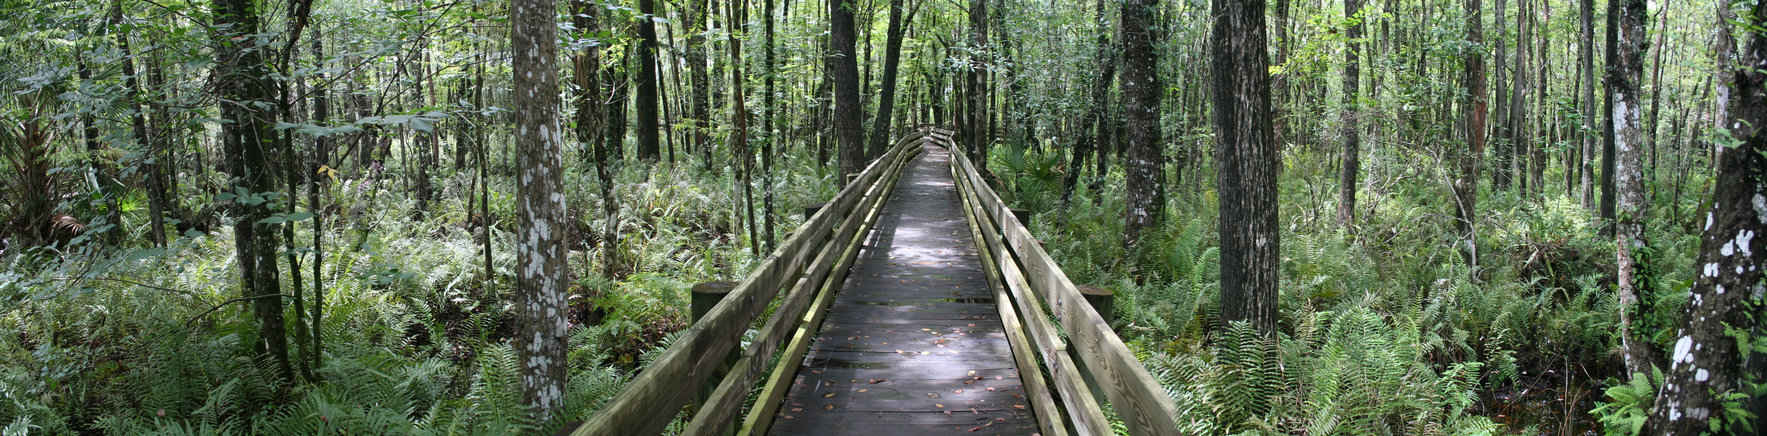 Six Mile Cypress Slough Field Trip image